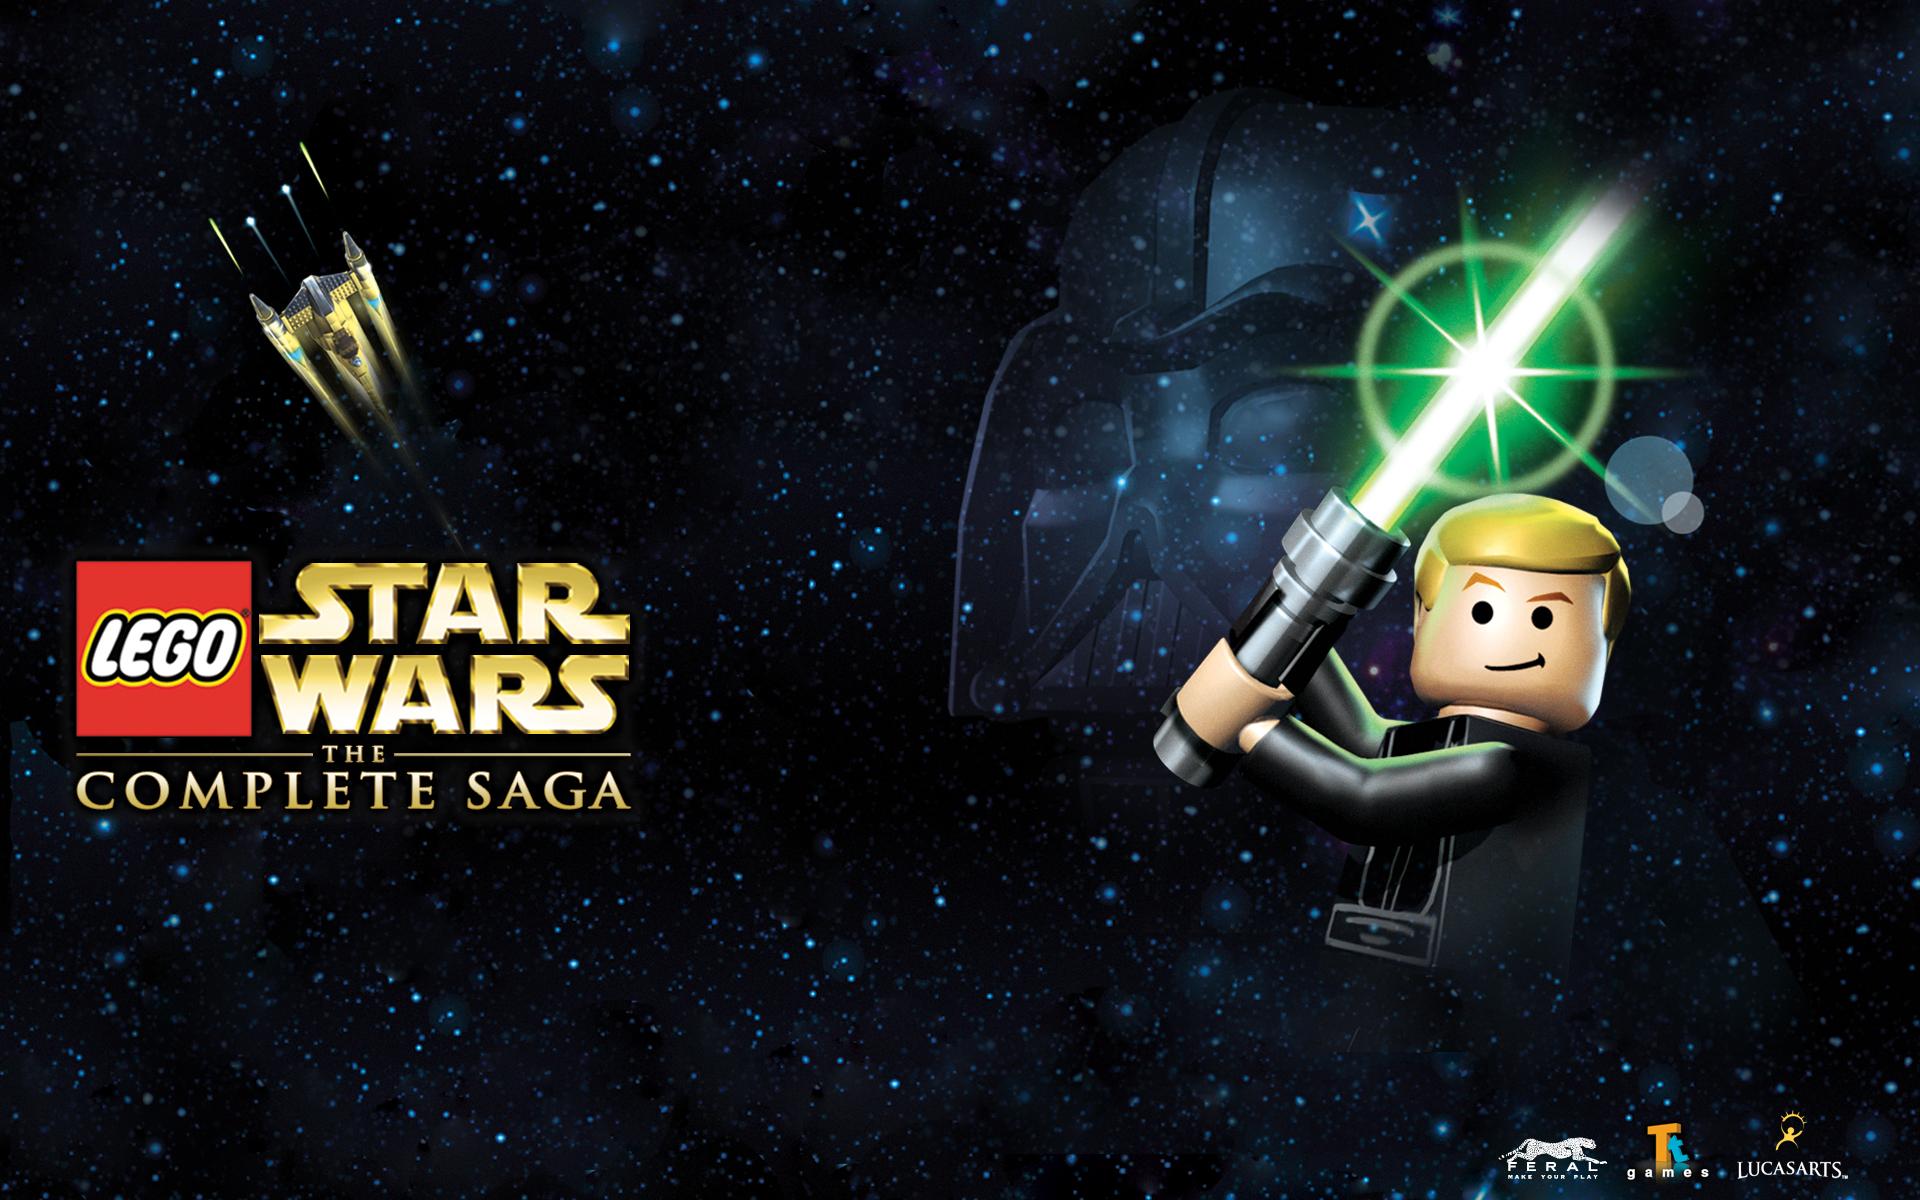 Star Wars Lego Wallpaper Hd 1920x1200 Wallpaper Teahub Io